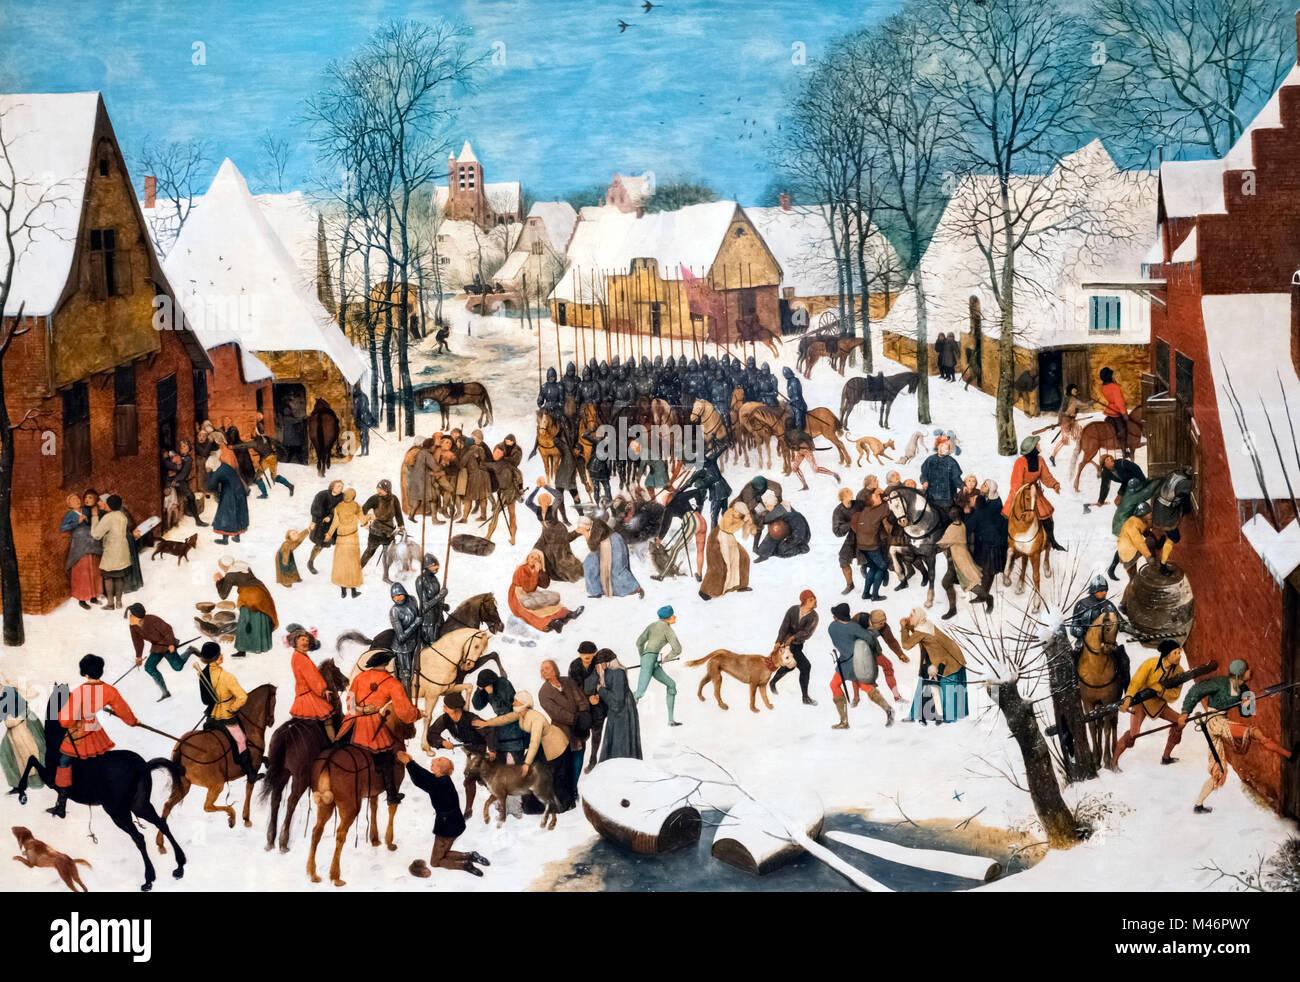 The Massacre of the Innocents by Pieter Bruegel the Elder (c.1525-1569), oil on panel, c.1565-7 - Stock Image